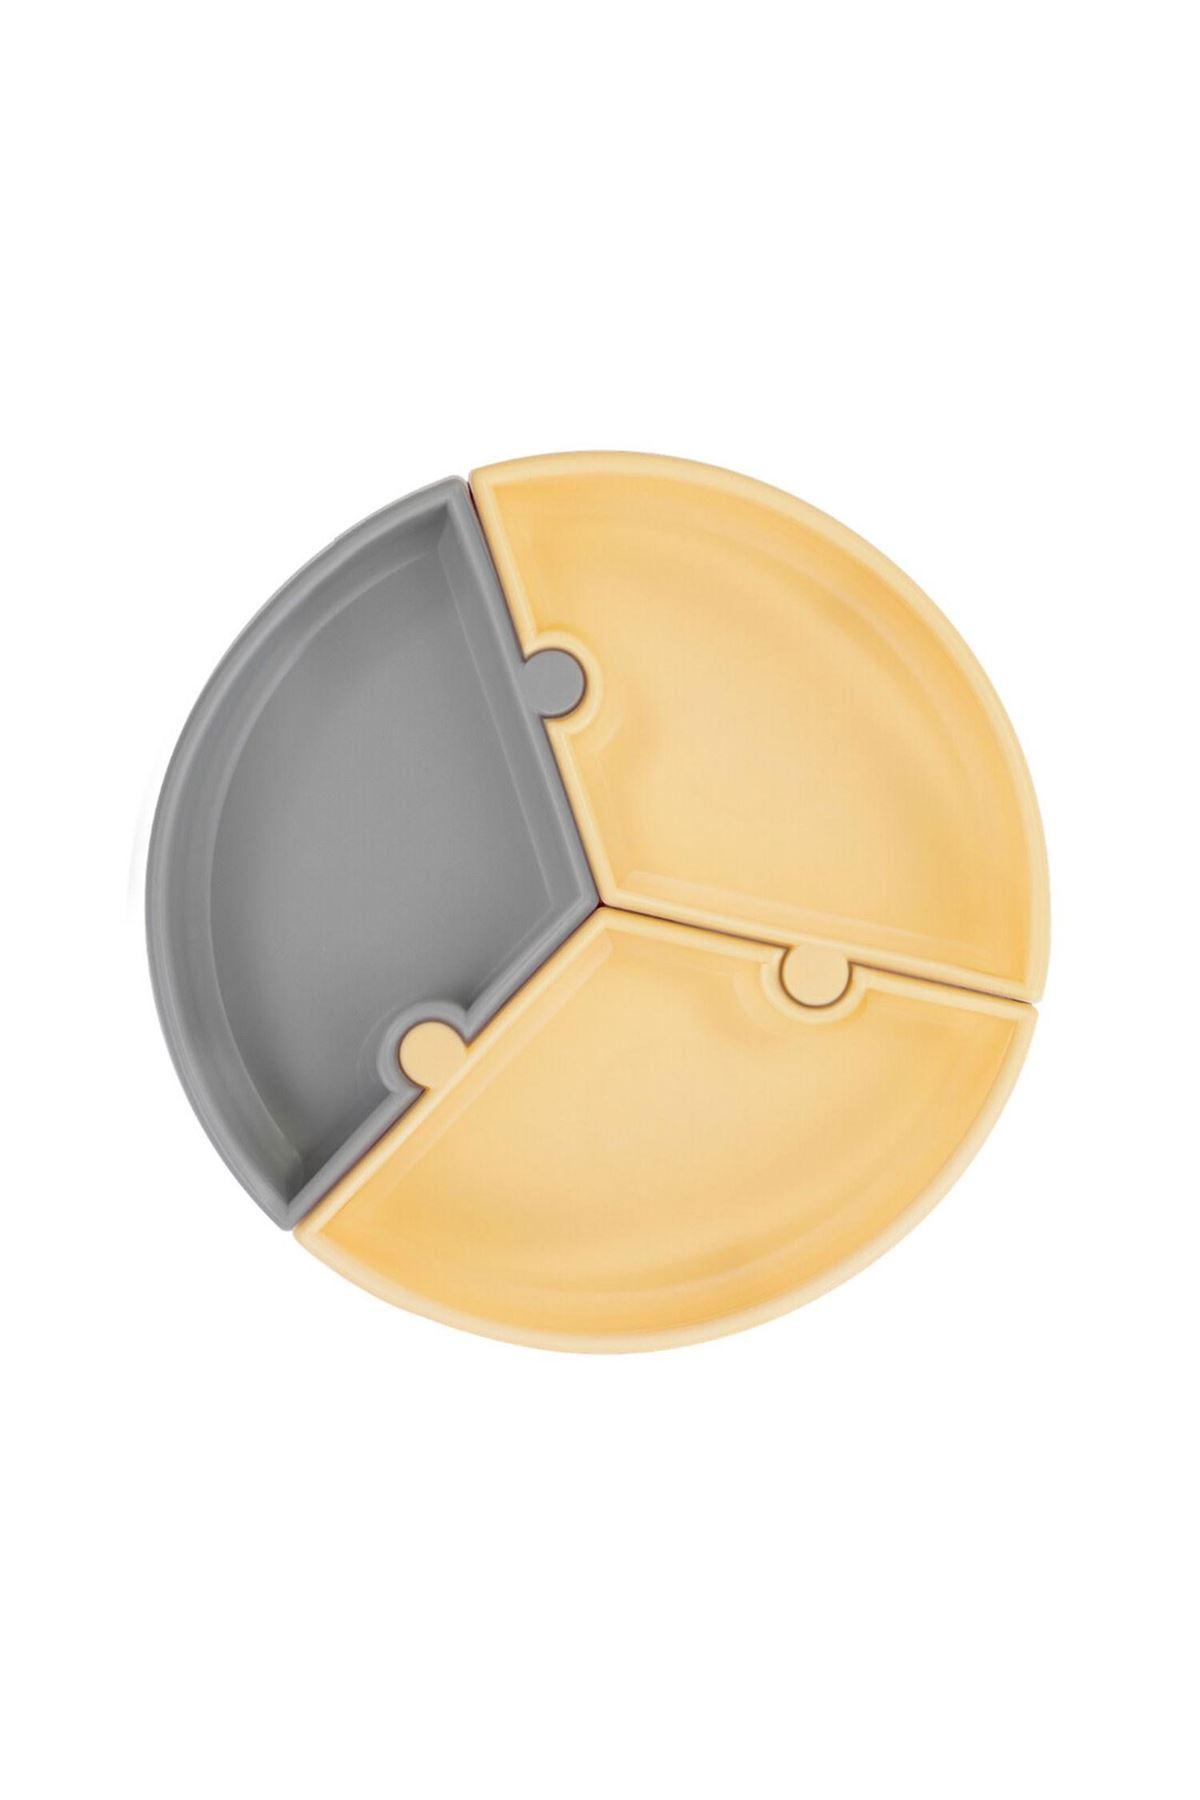 OiOi Puzzle Vakum Tabanlı Silikon Tabak Sarı Gri